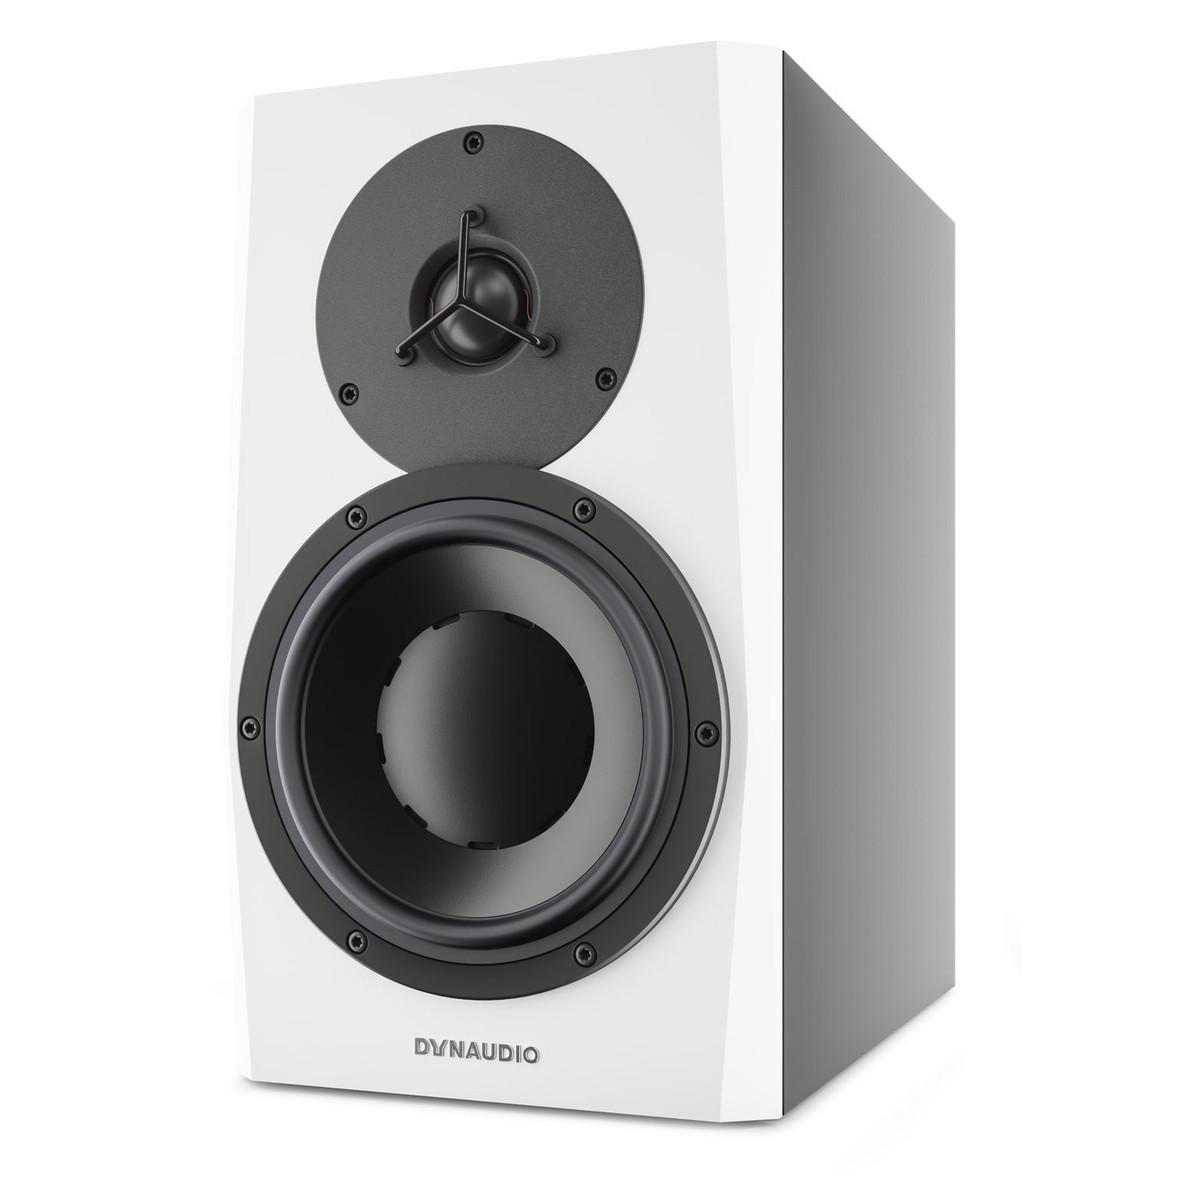 dynaudio lyd 7 near field studio monitor single at gear4music. Black Bedroom Furniture Sets. Home Design Ideas